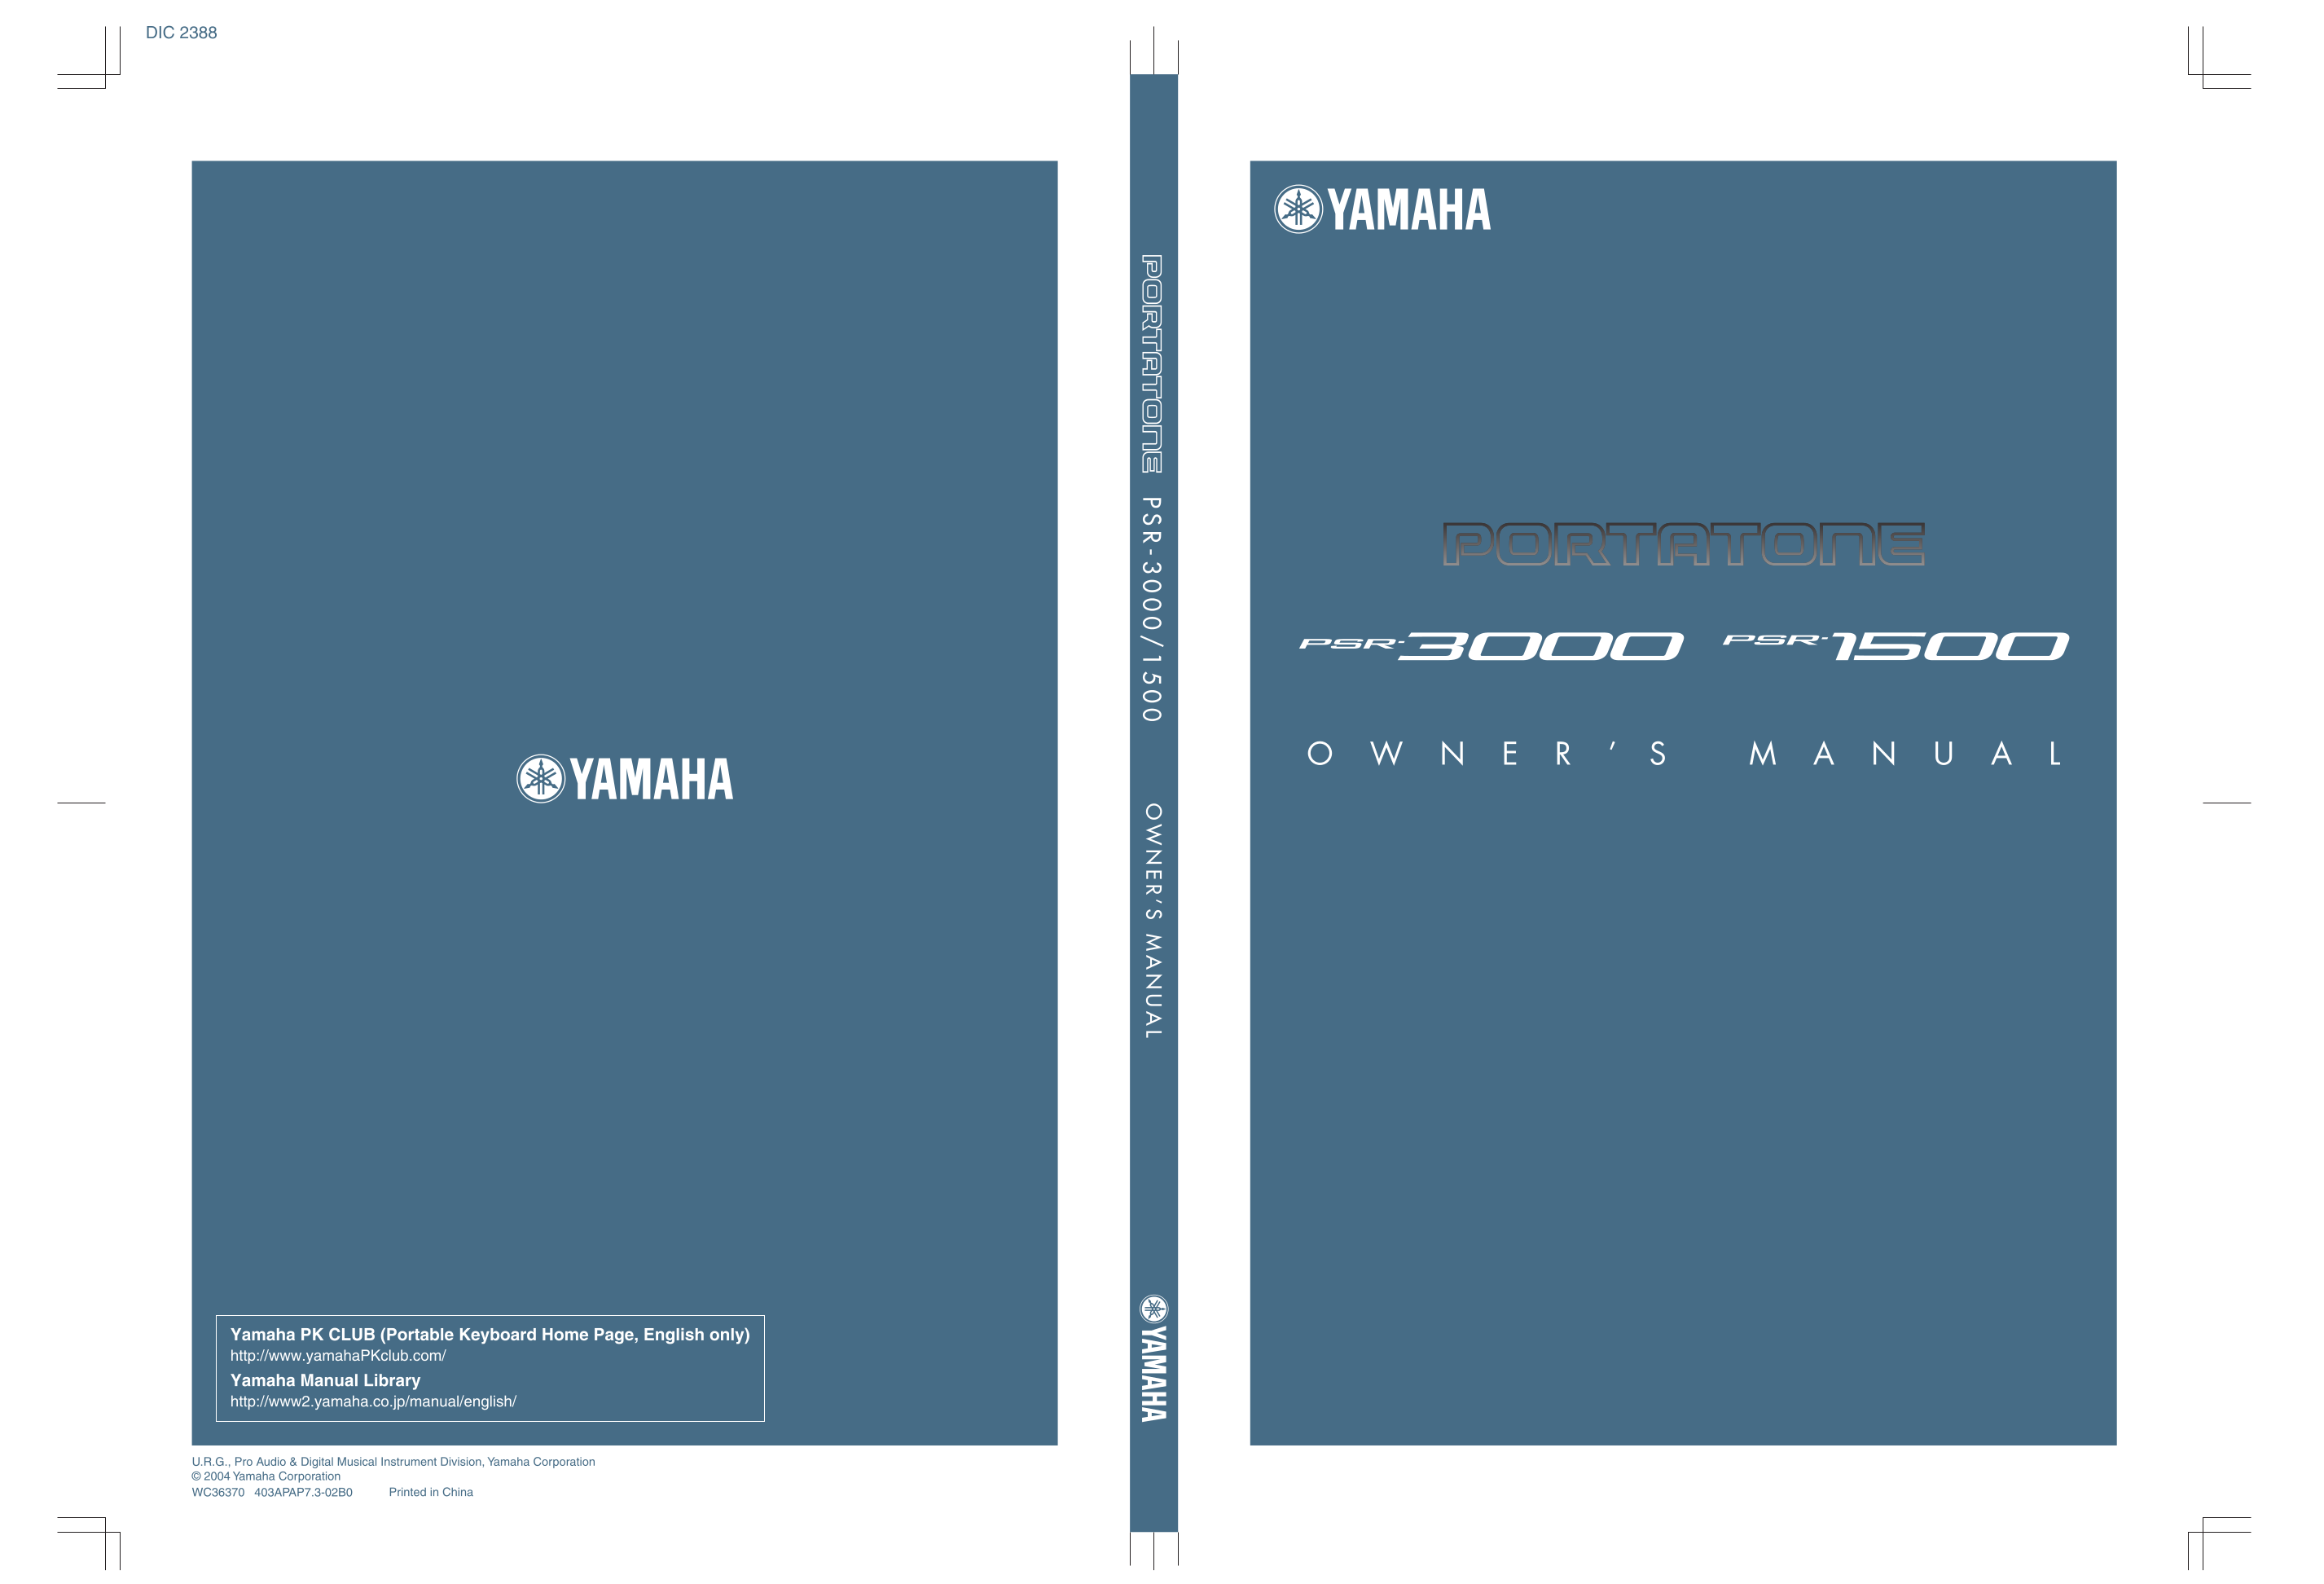 Autolite 2100 service Manual Yamaha 115 outboard